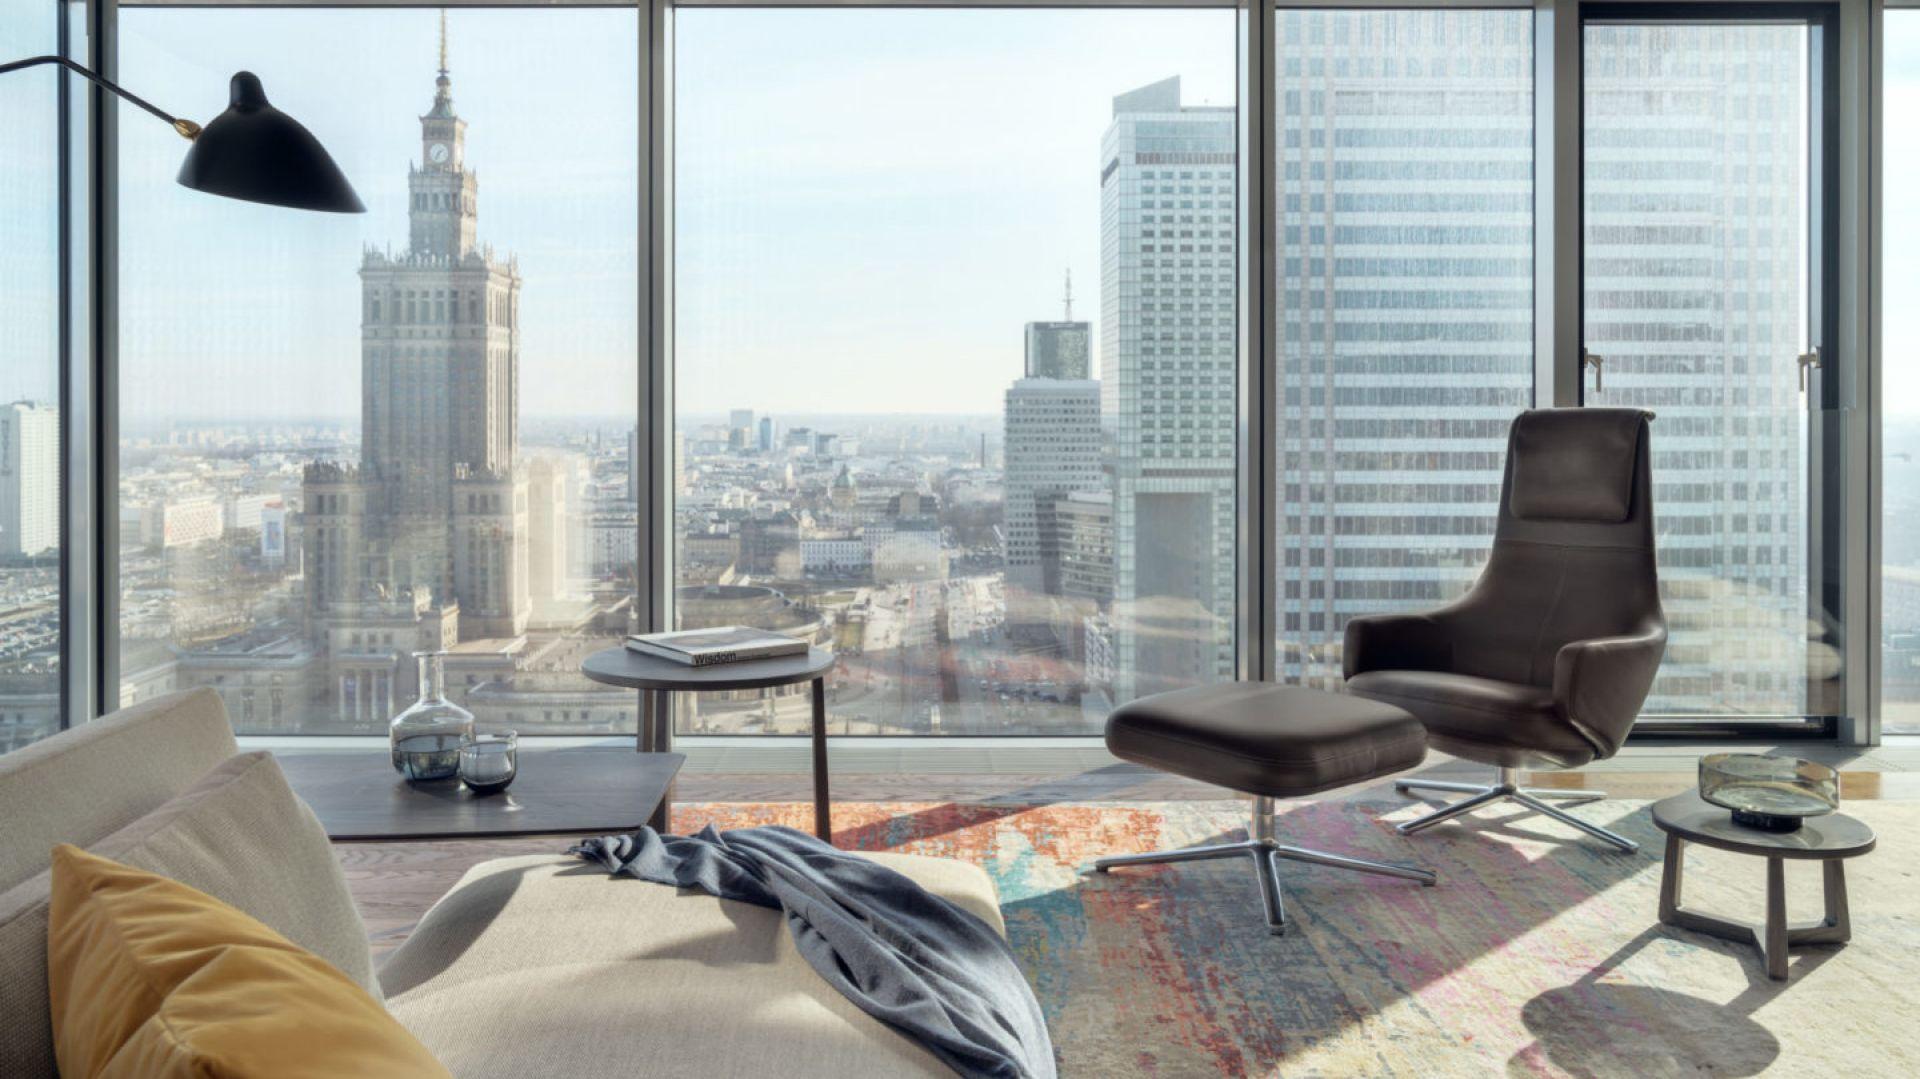 Kraszewska_Apartament w Cosmopolitan_4.jpg